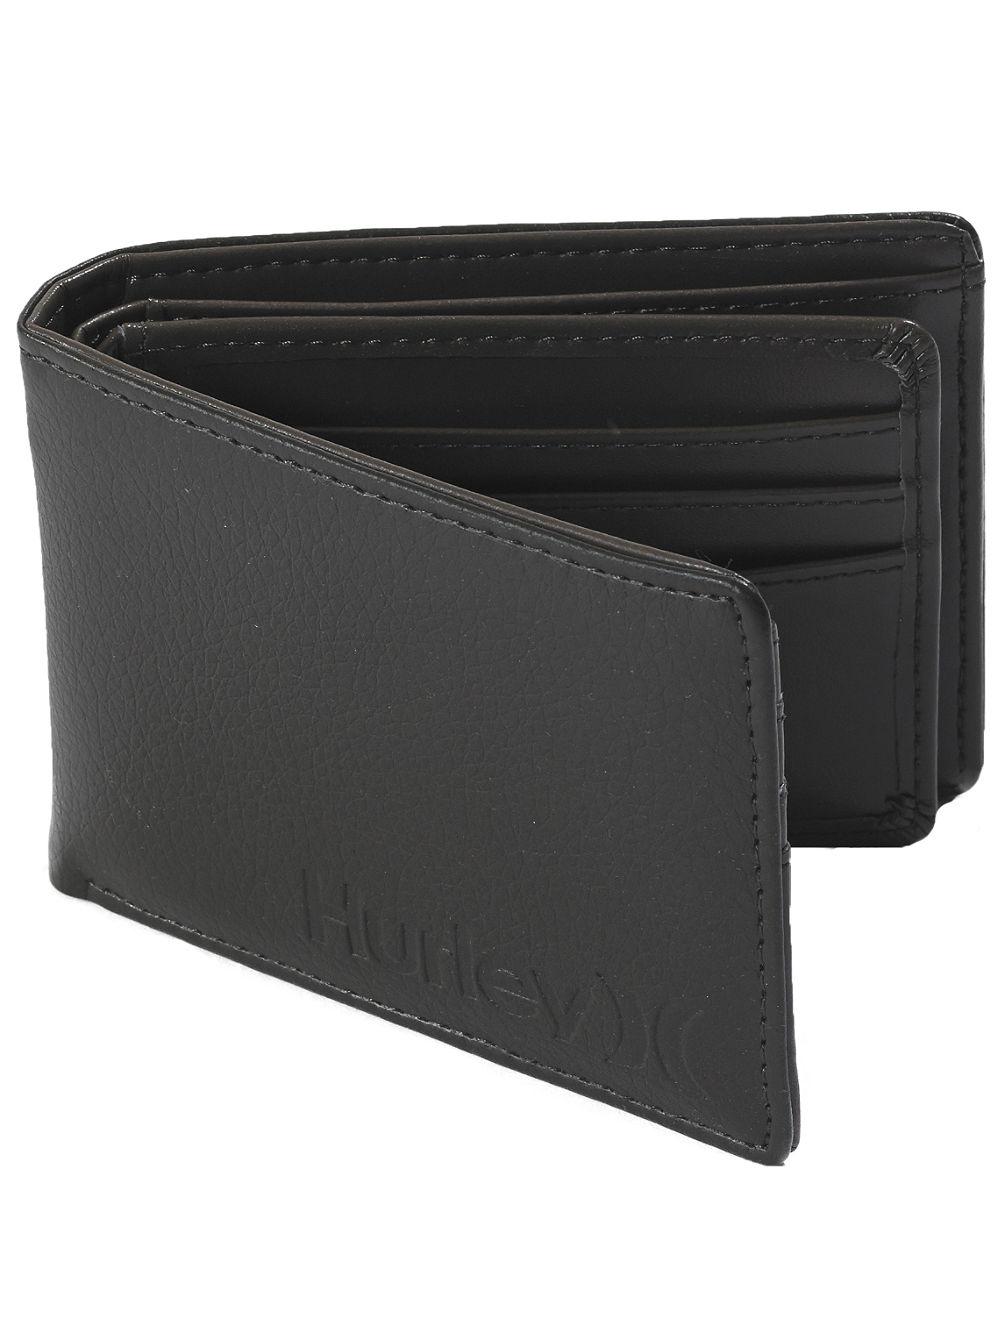 oo-solid-wallet